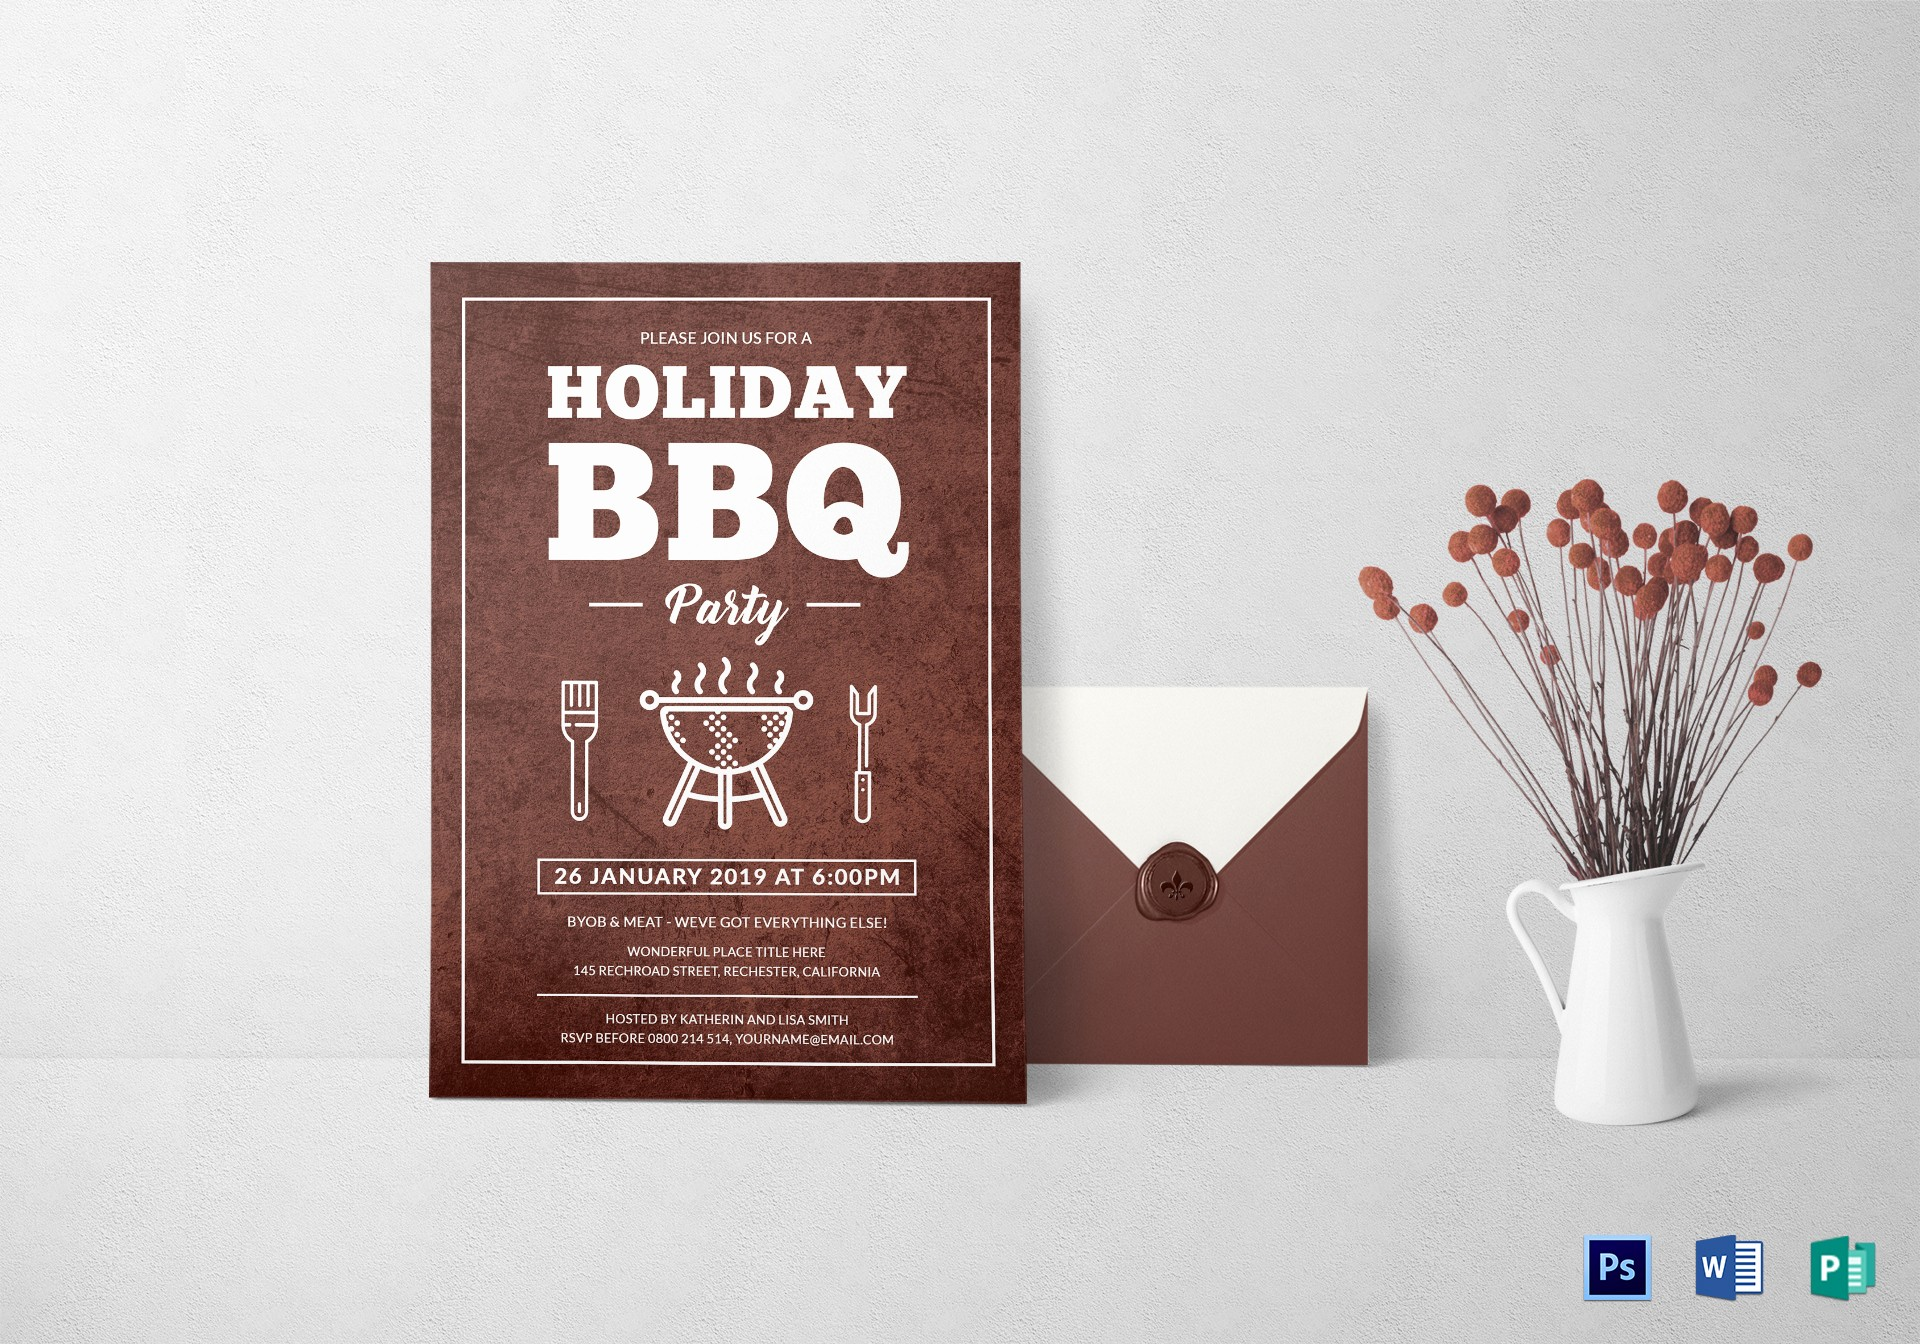 Bbq Party Invitation Templates Free New Bbq Party Invitation Design Template In Word Psd Publisher